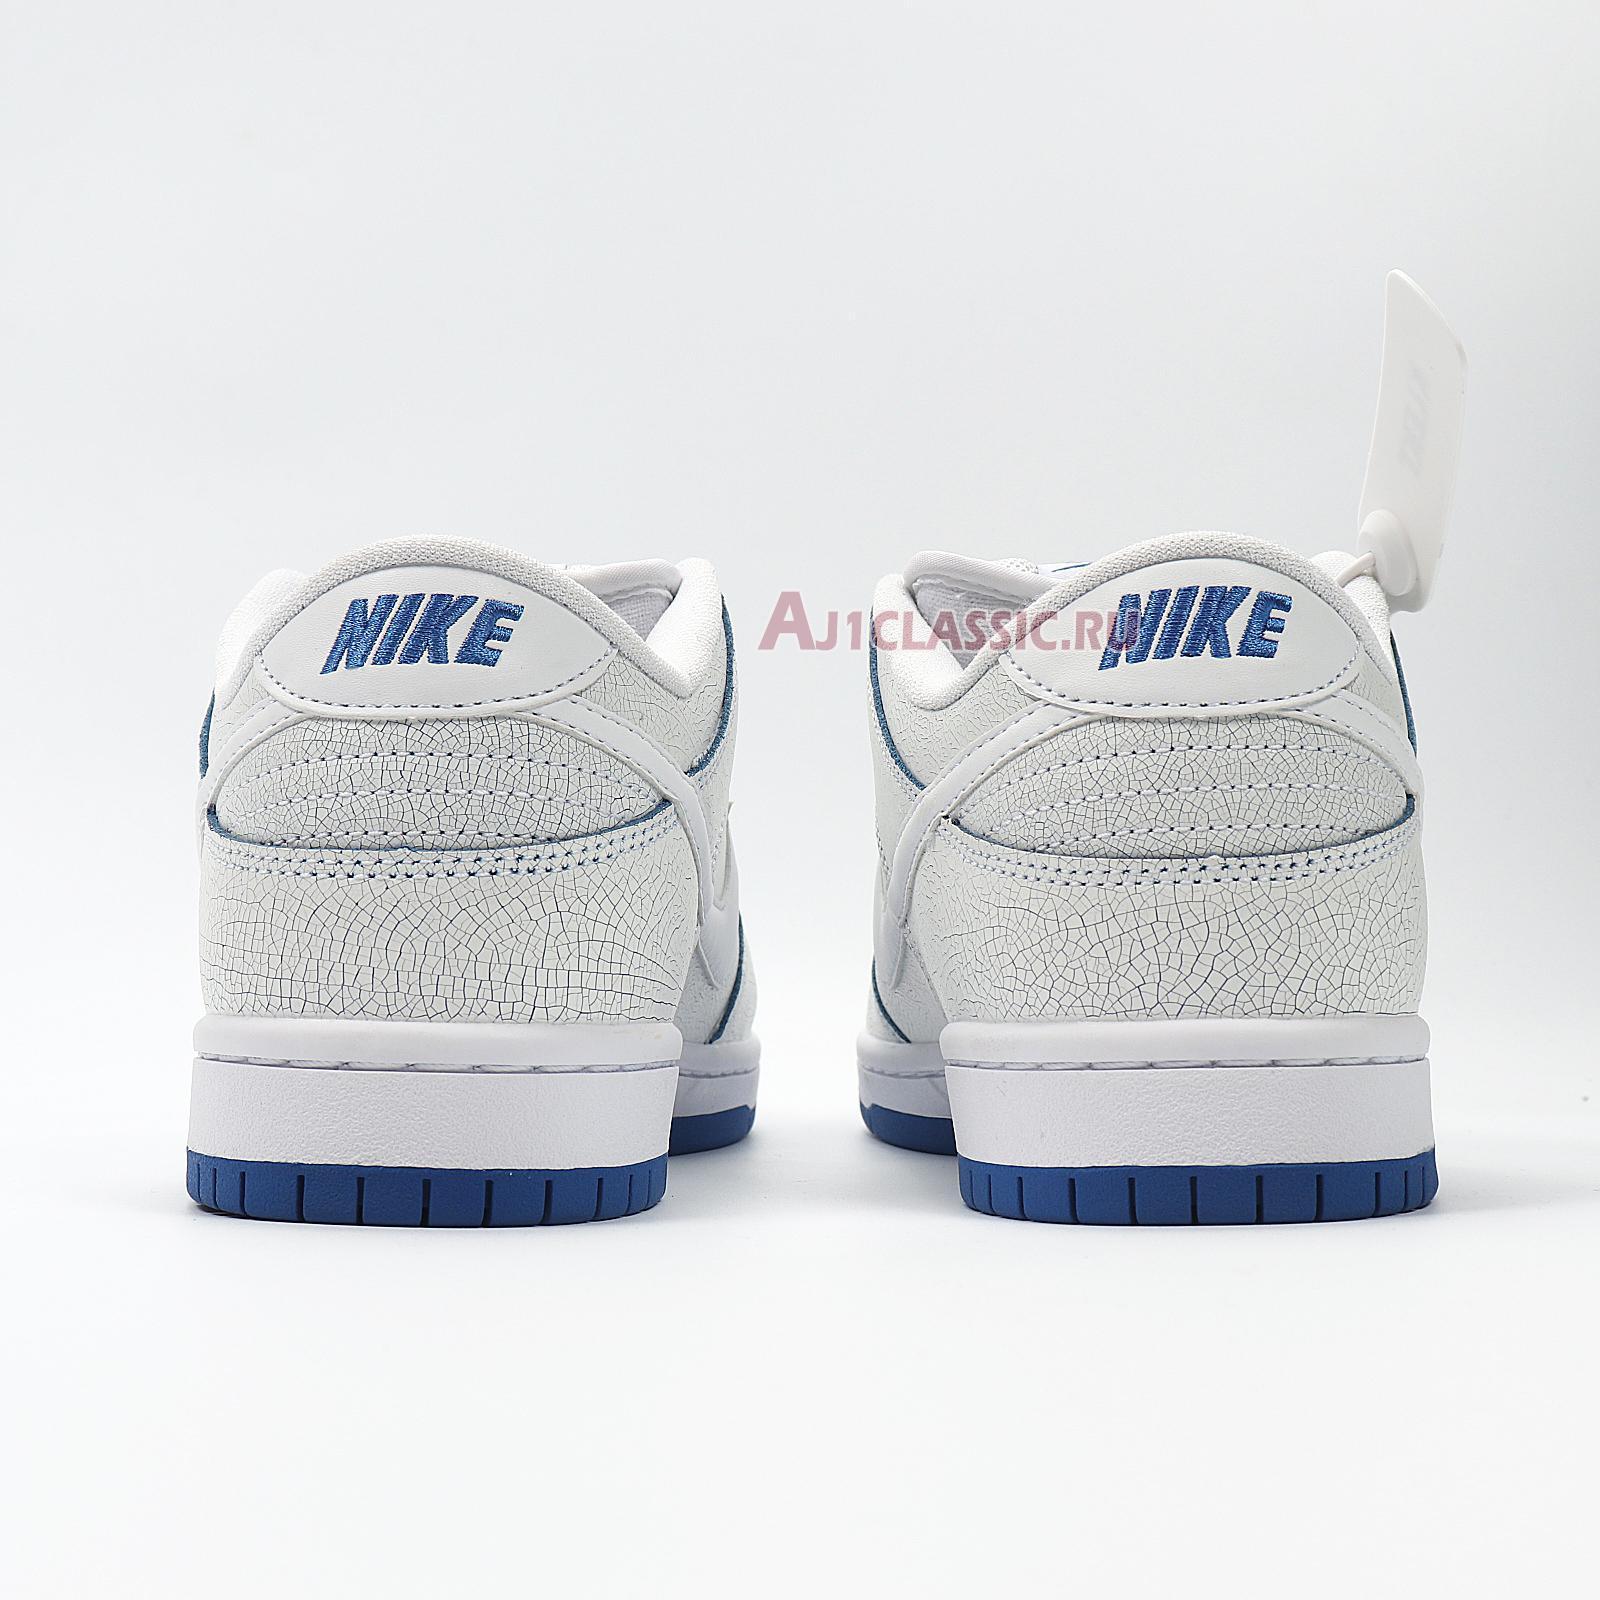 "Nike Dunk Low Premium SB ""Cracked Leather"" CJ6884-100"